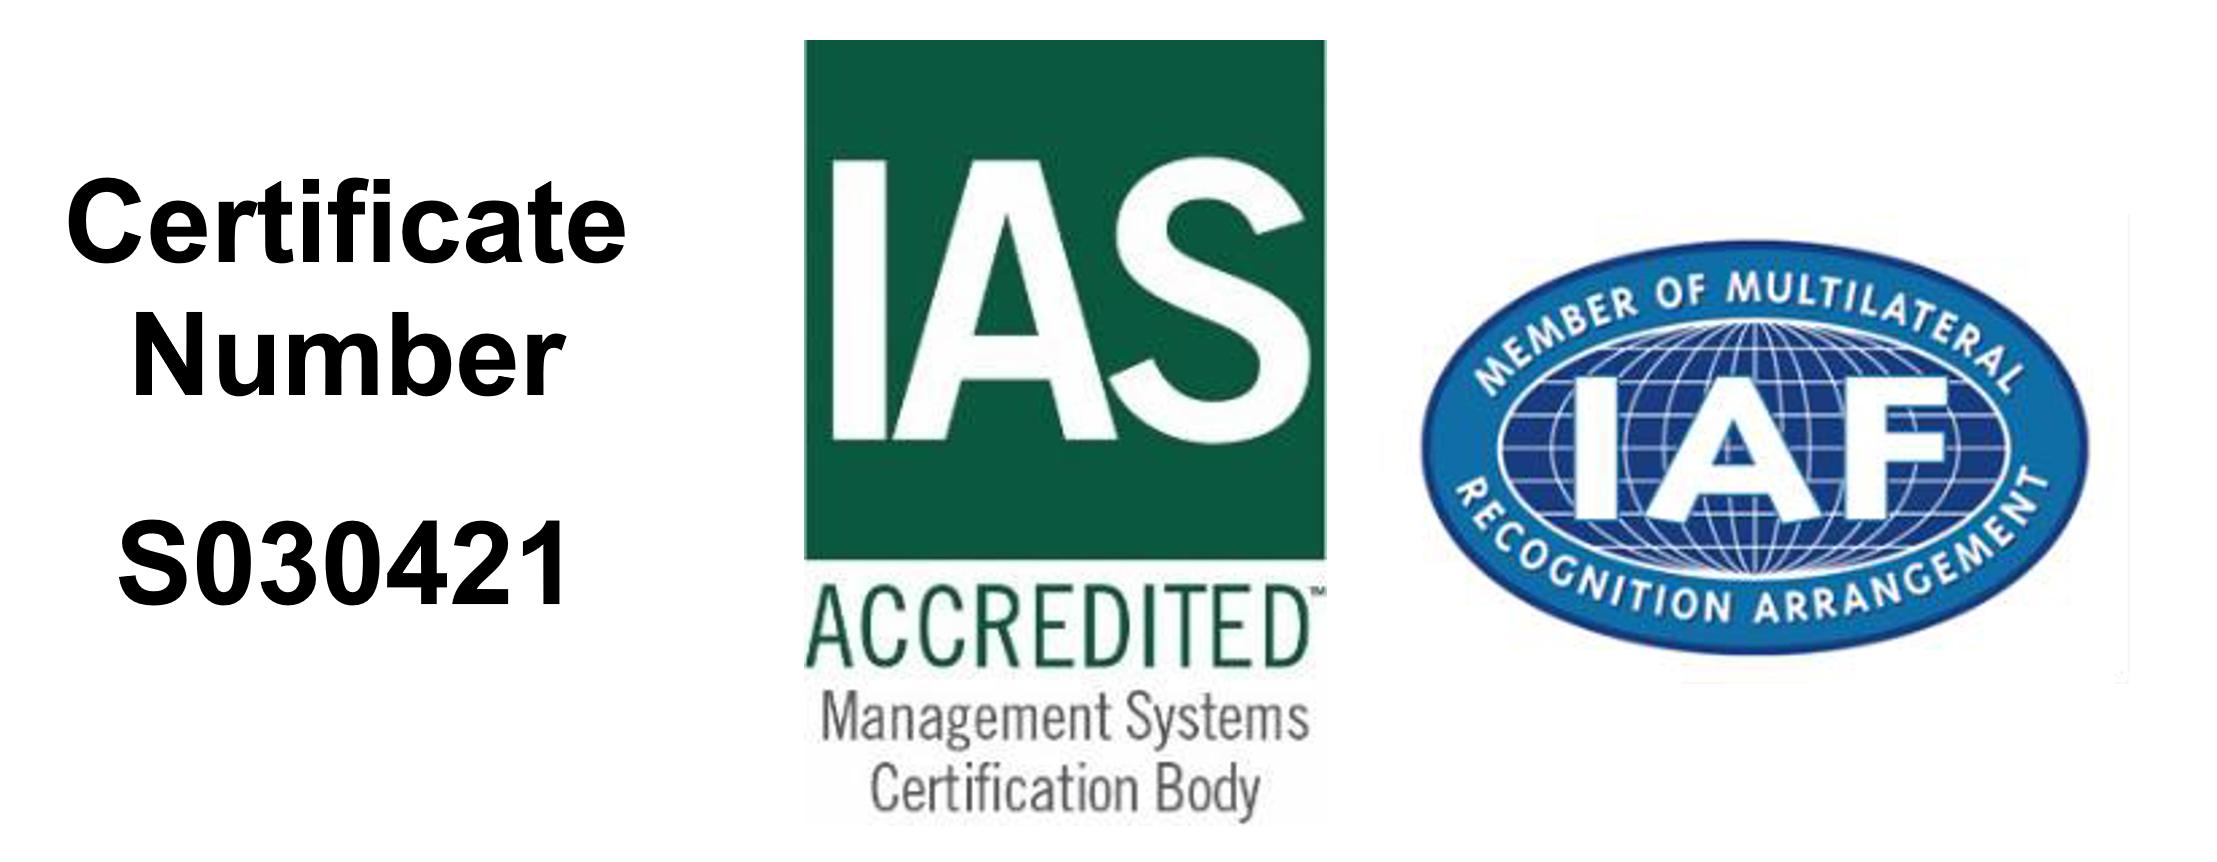 SST Quality Management System